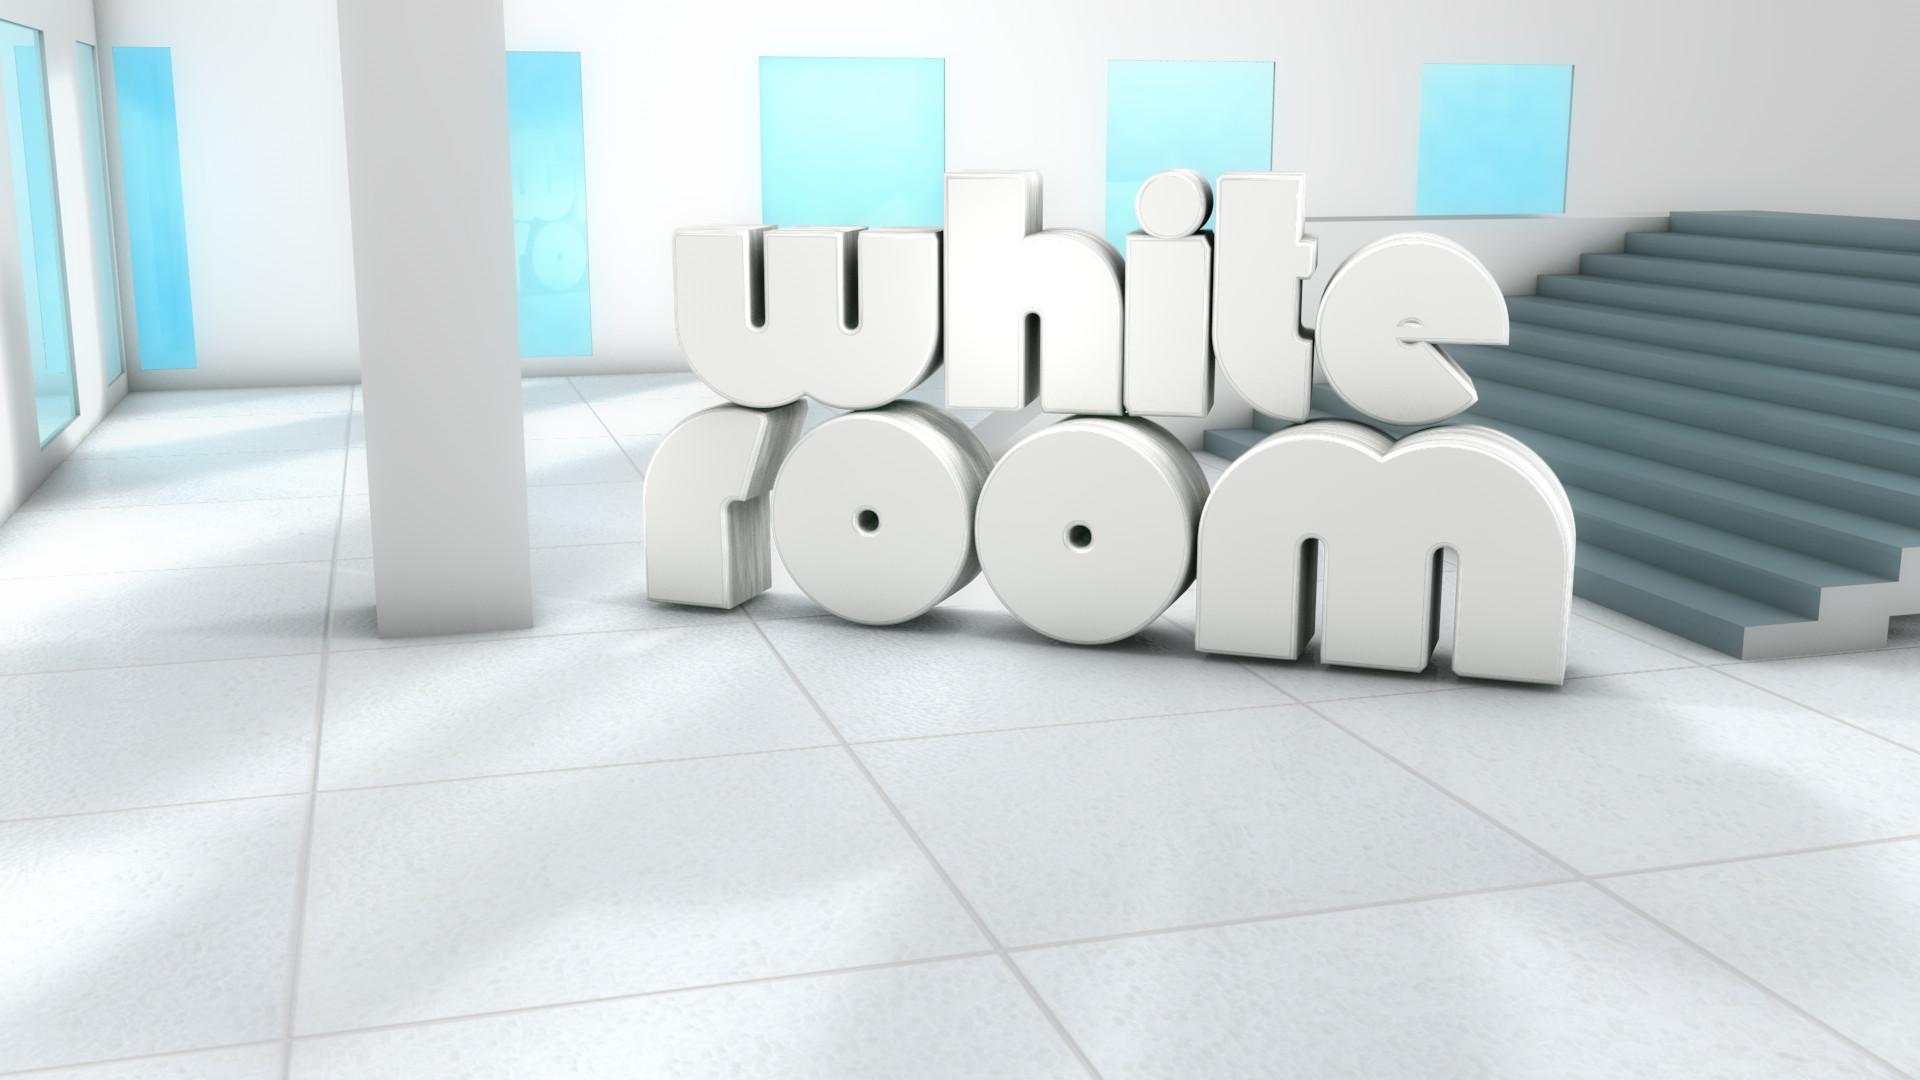 Cinema 4D -- WhiteRoom by SMOKEYoriginalHD